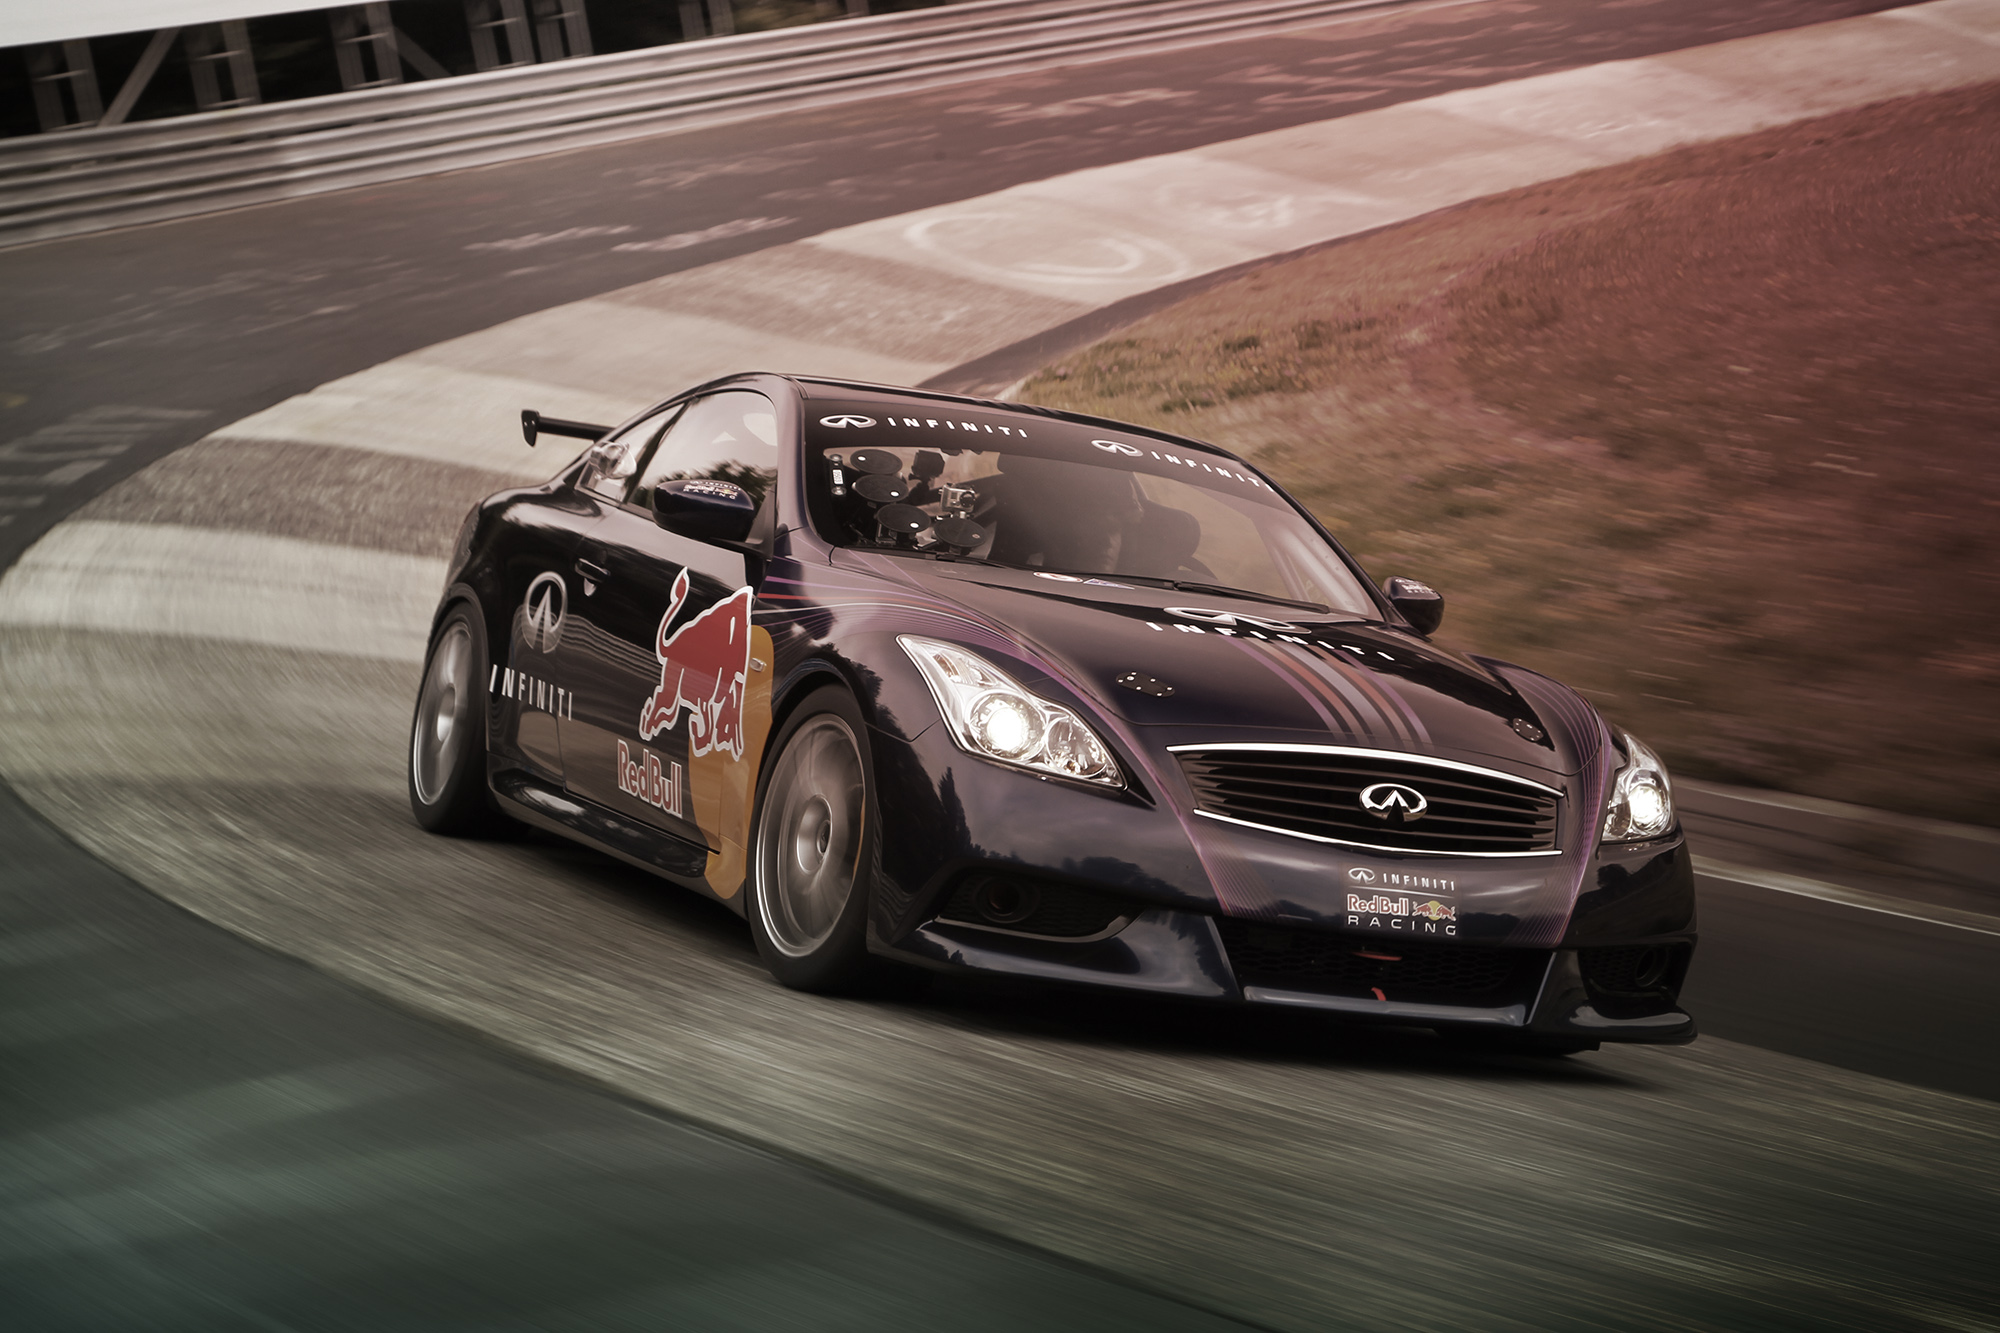 G37+Coupe+Track+Car-6 LR.jpg